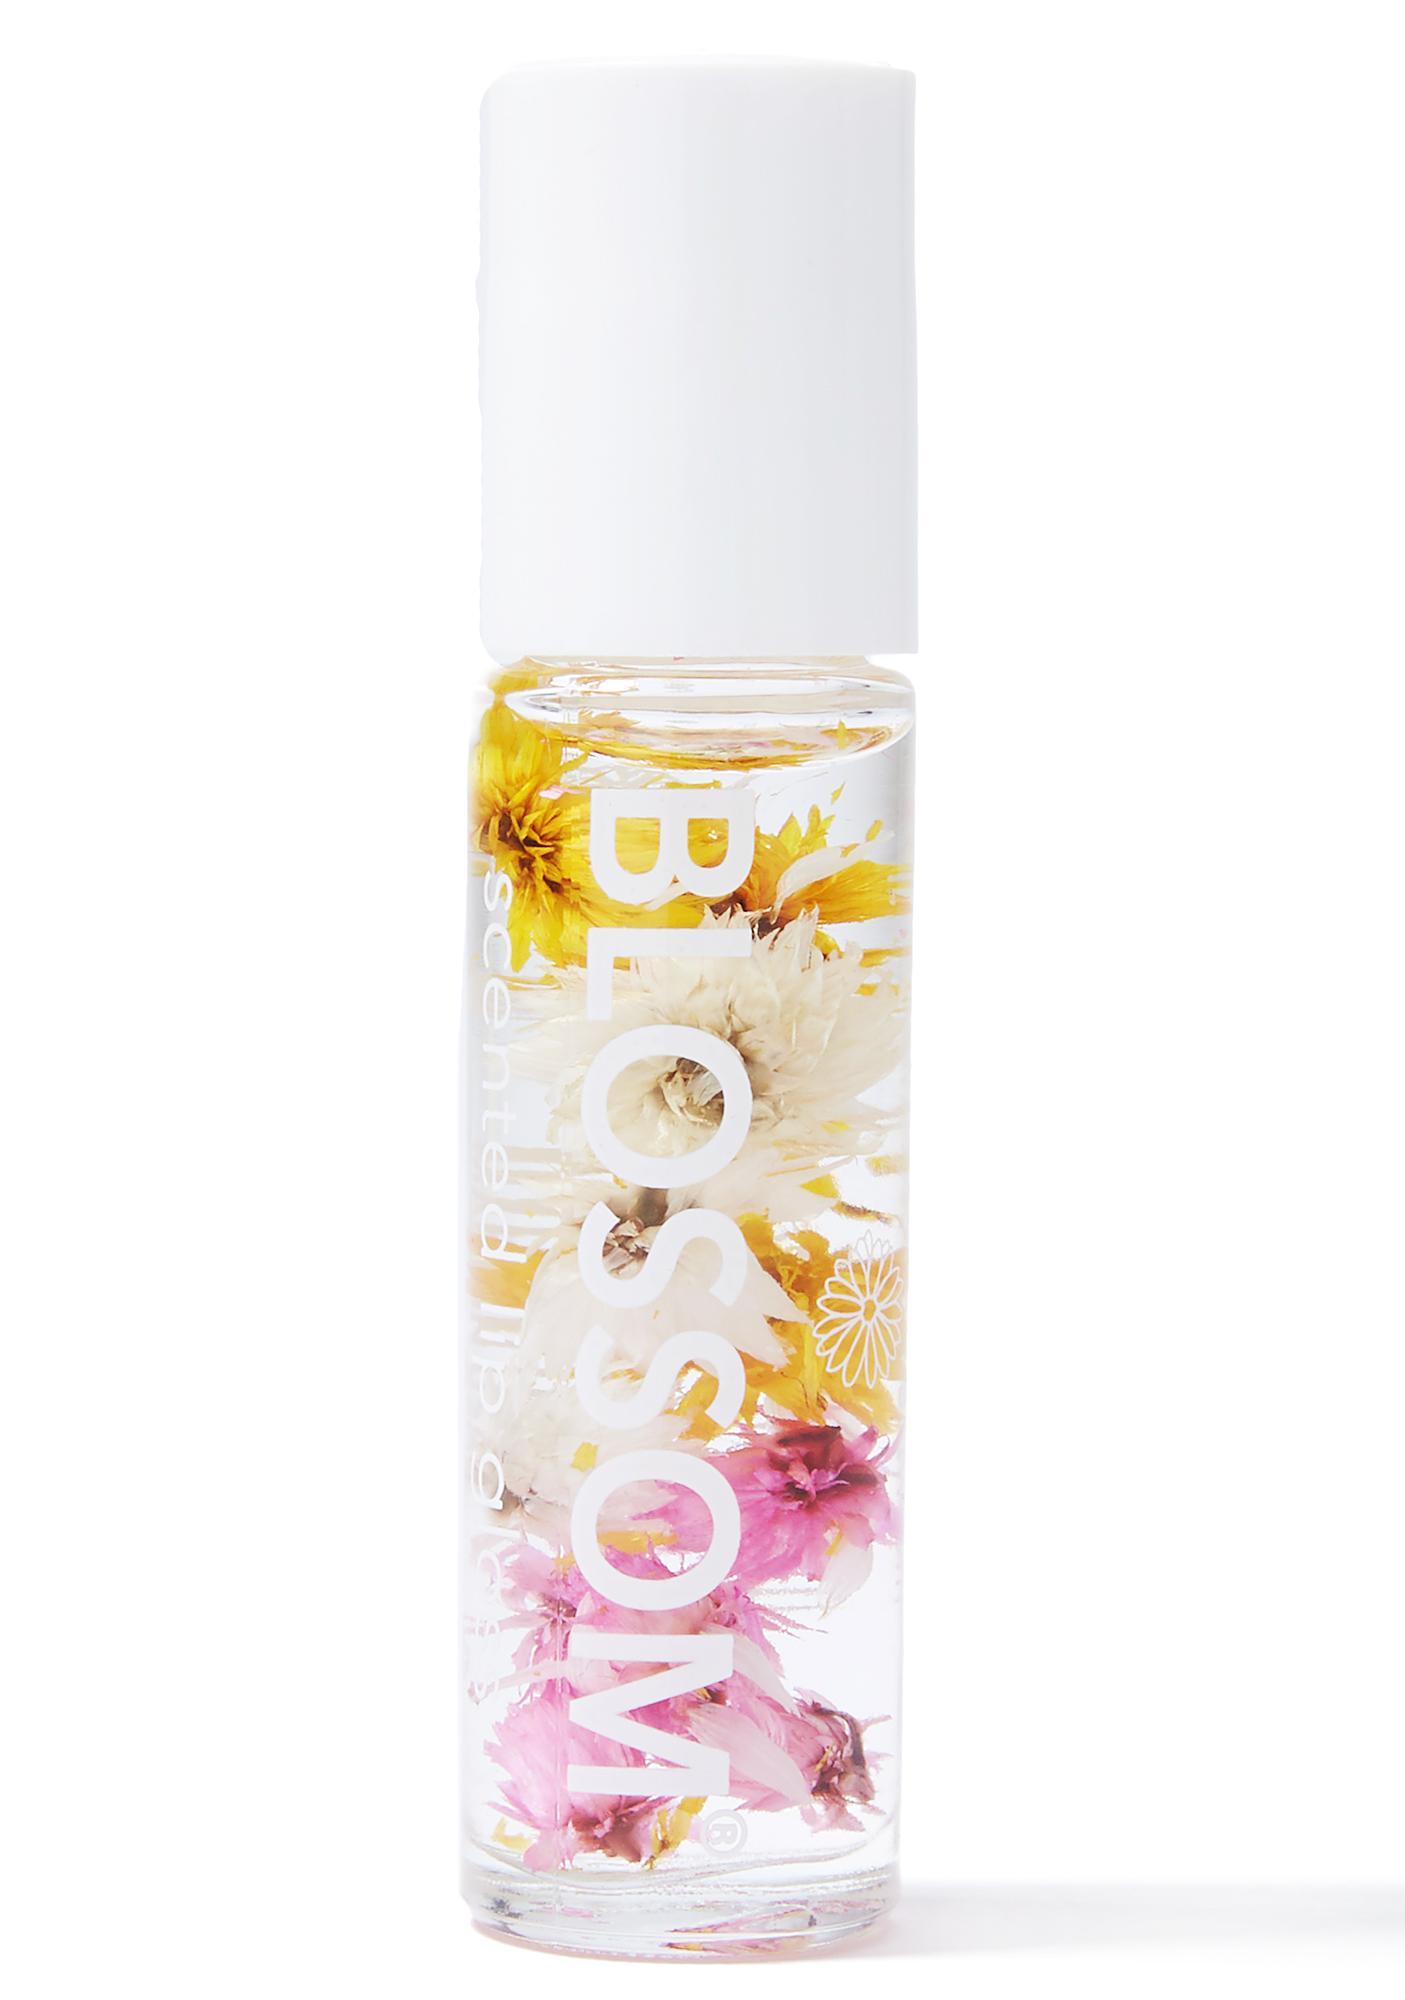 Blossom Juicy Peach Roll On Lip Gloss